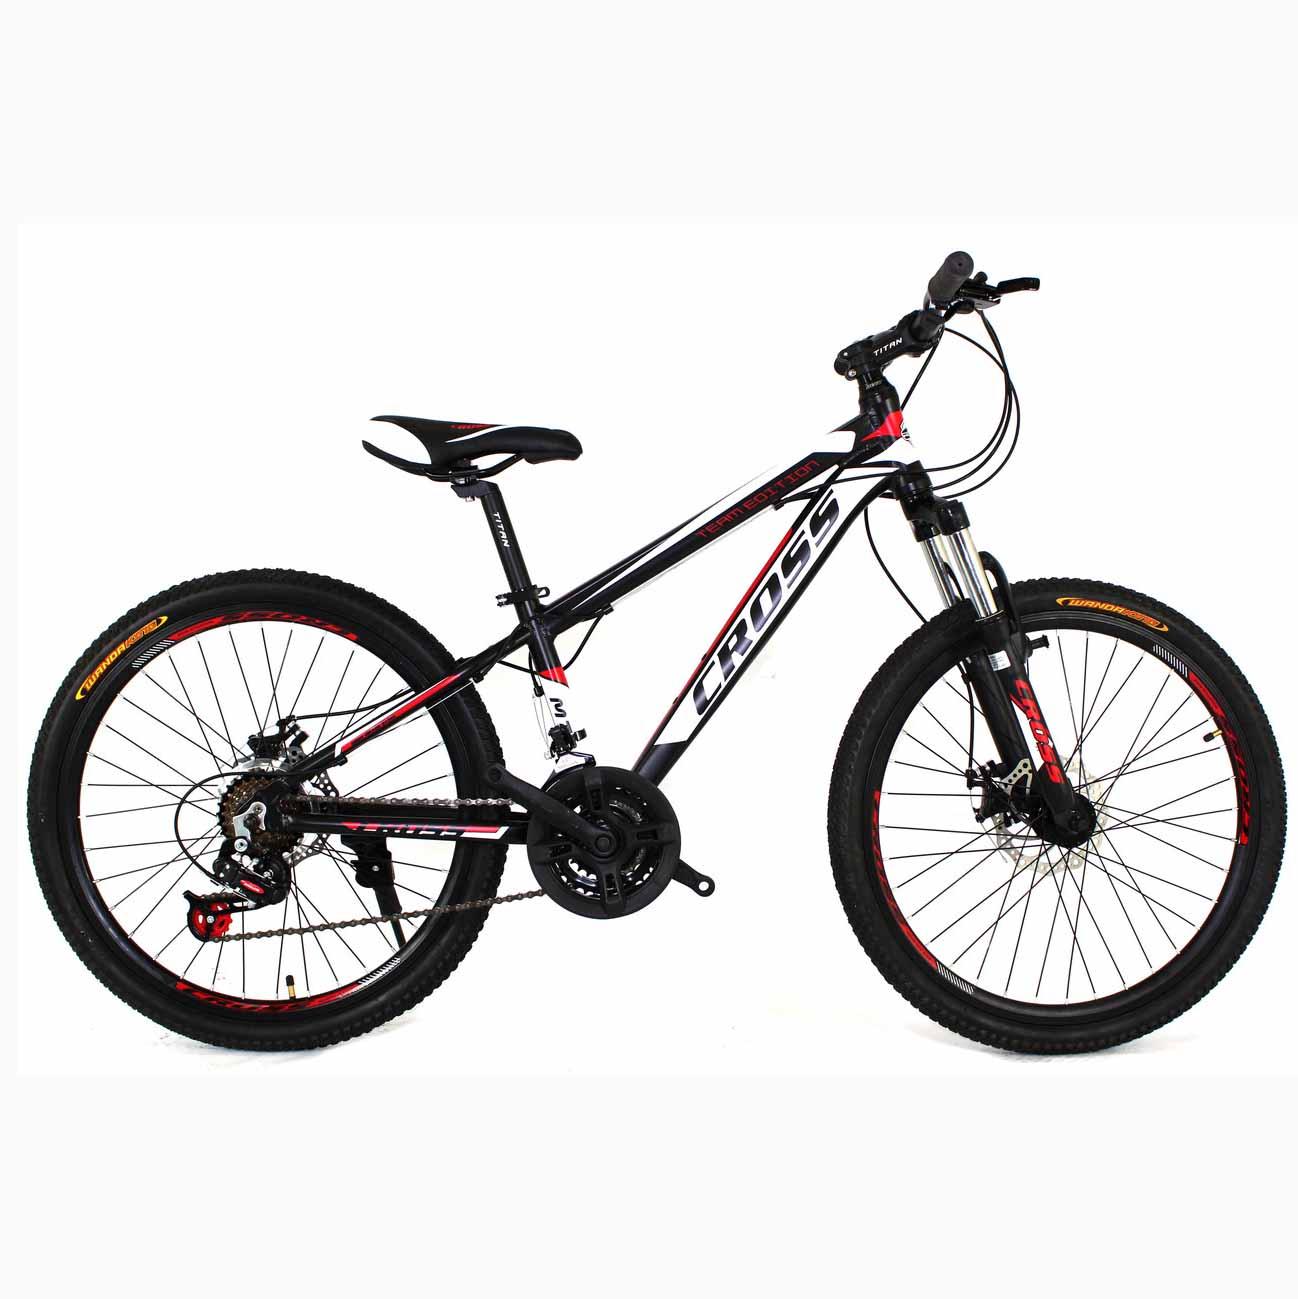 Фото Подростковый Велосипед Cross Hunter 24 Black-White-Red